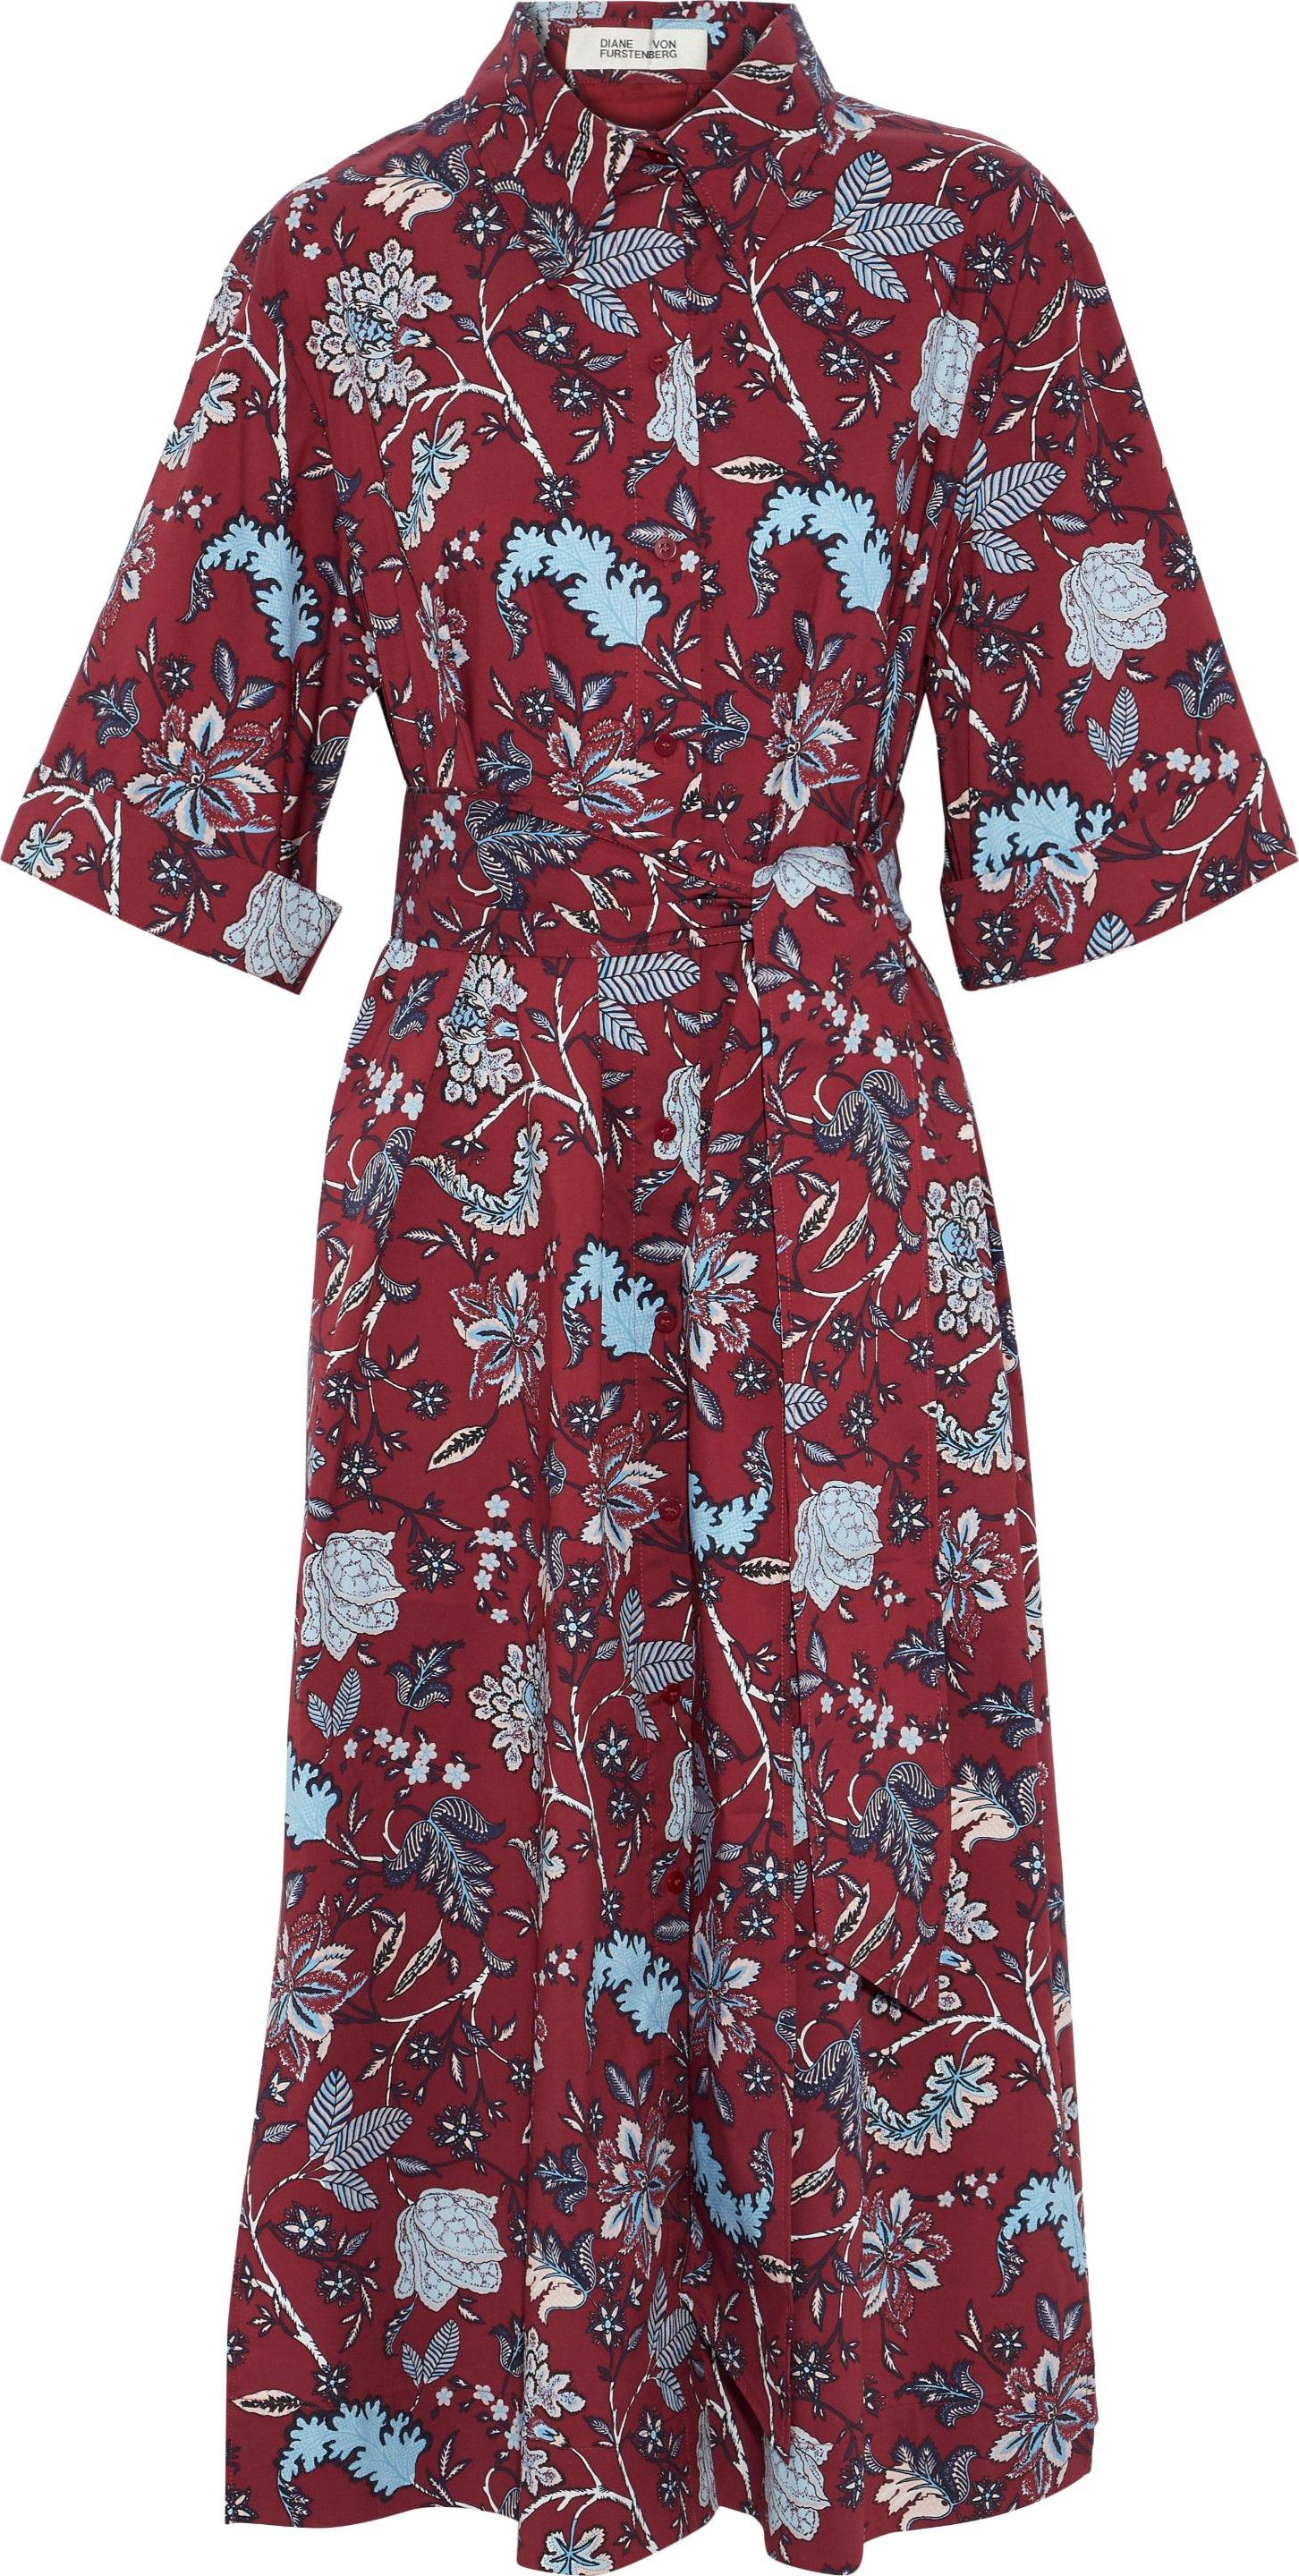 85334b437bcb diane-von-furstenberg-floral-print-cotton-blend-poplin-midi-shirt-dress.jpg